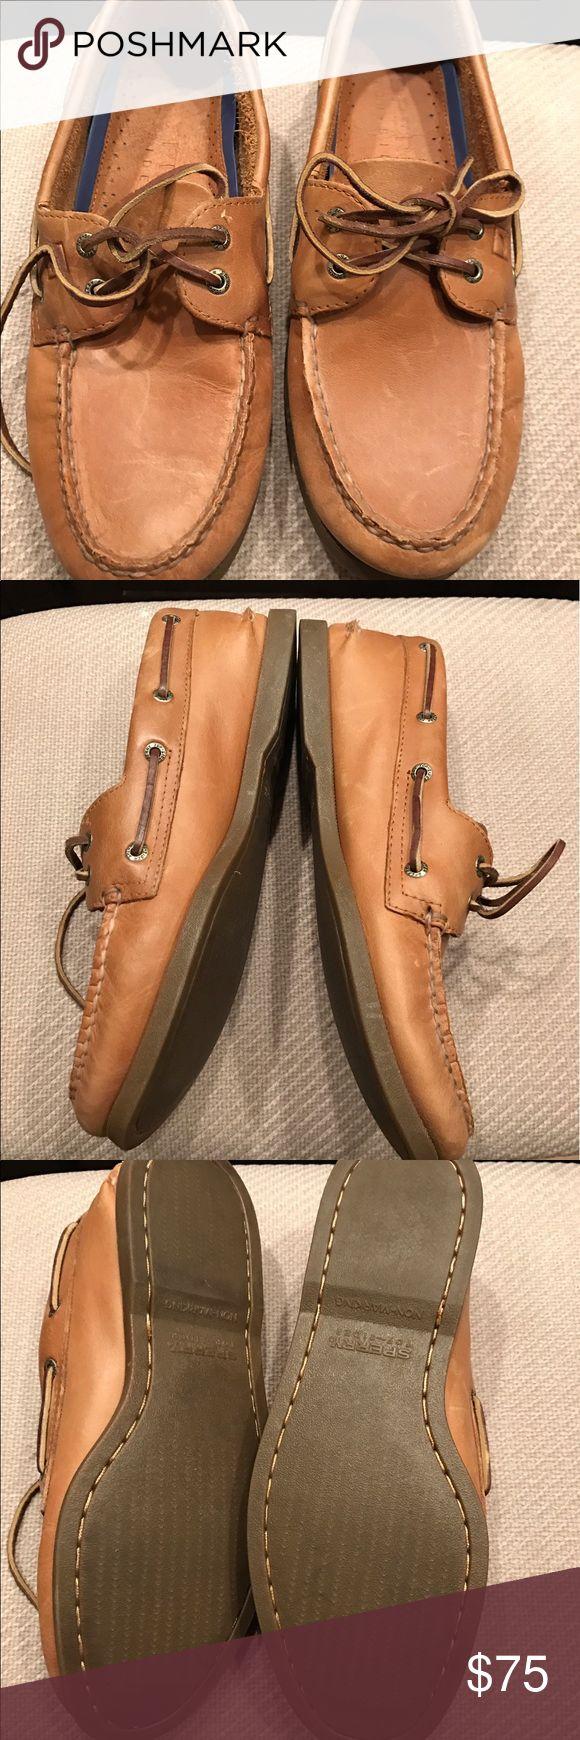 Men's sperrys size 10 brand new never worn Men's sperrys size 10 brand new never worn Sperry Shoes Boat Shoes